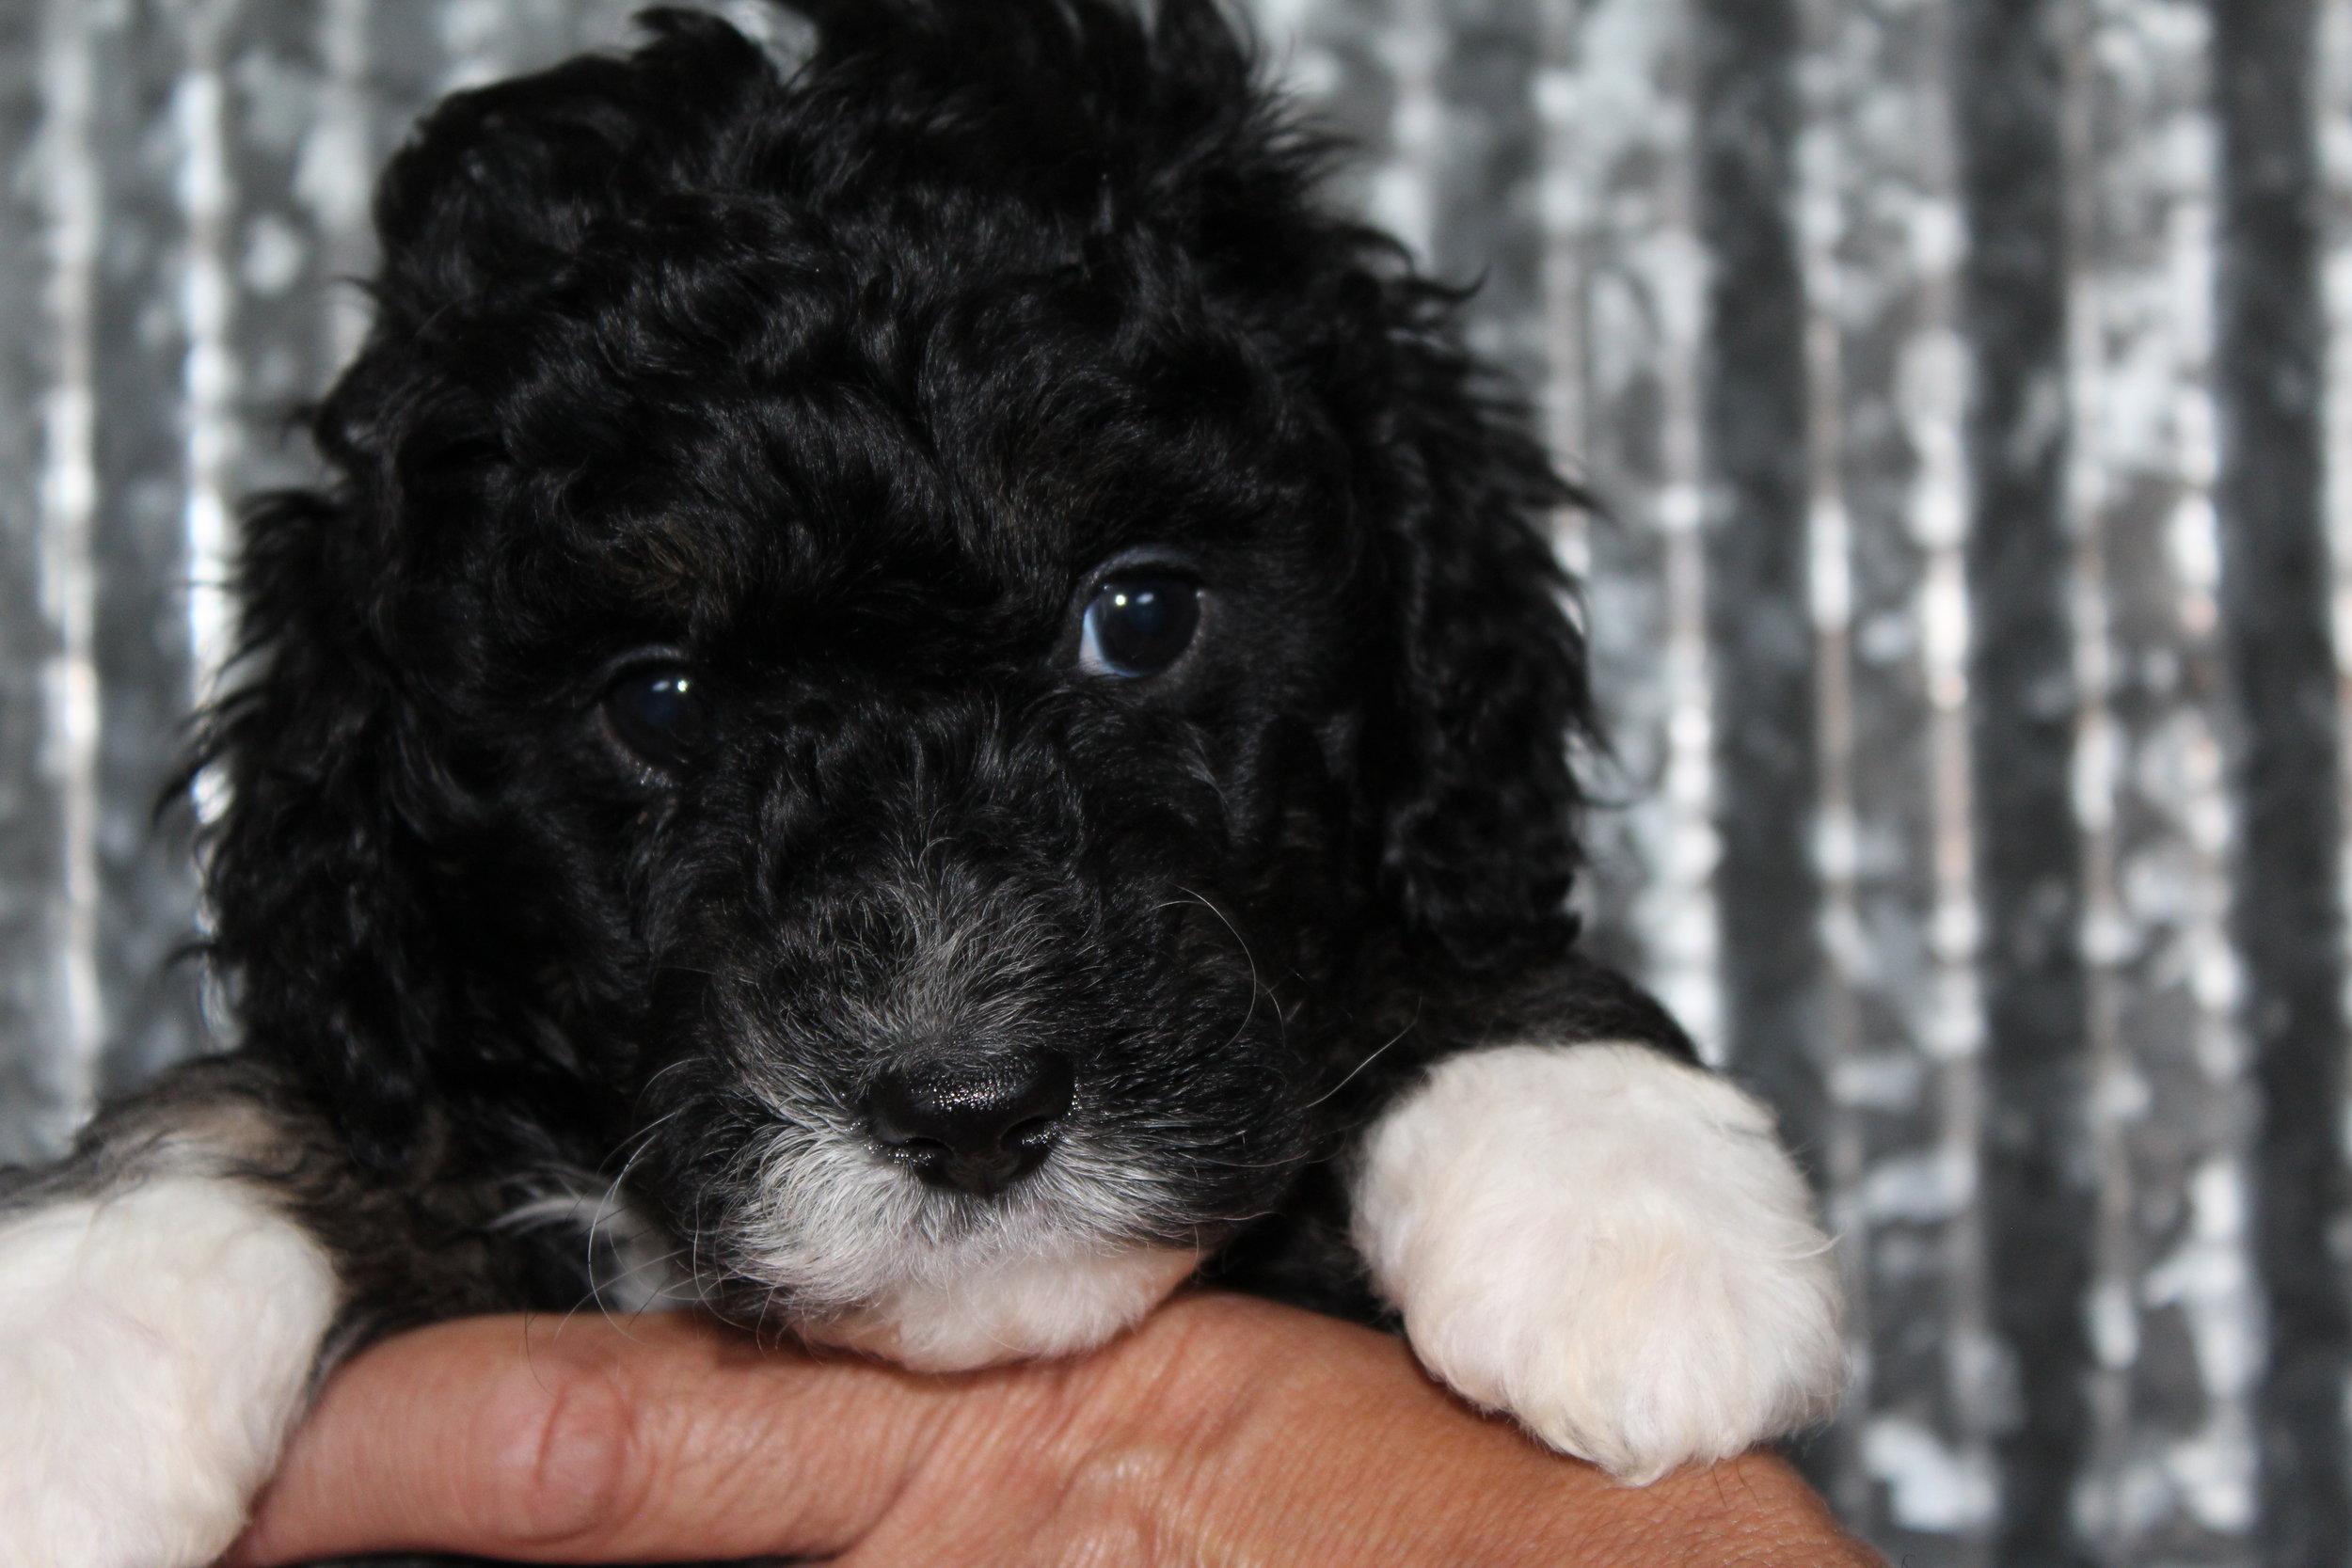 Peep!    5 1/2 weeks